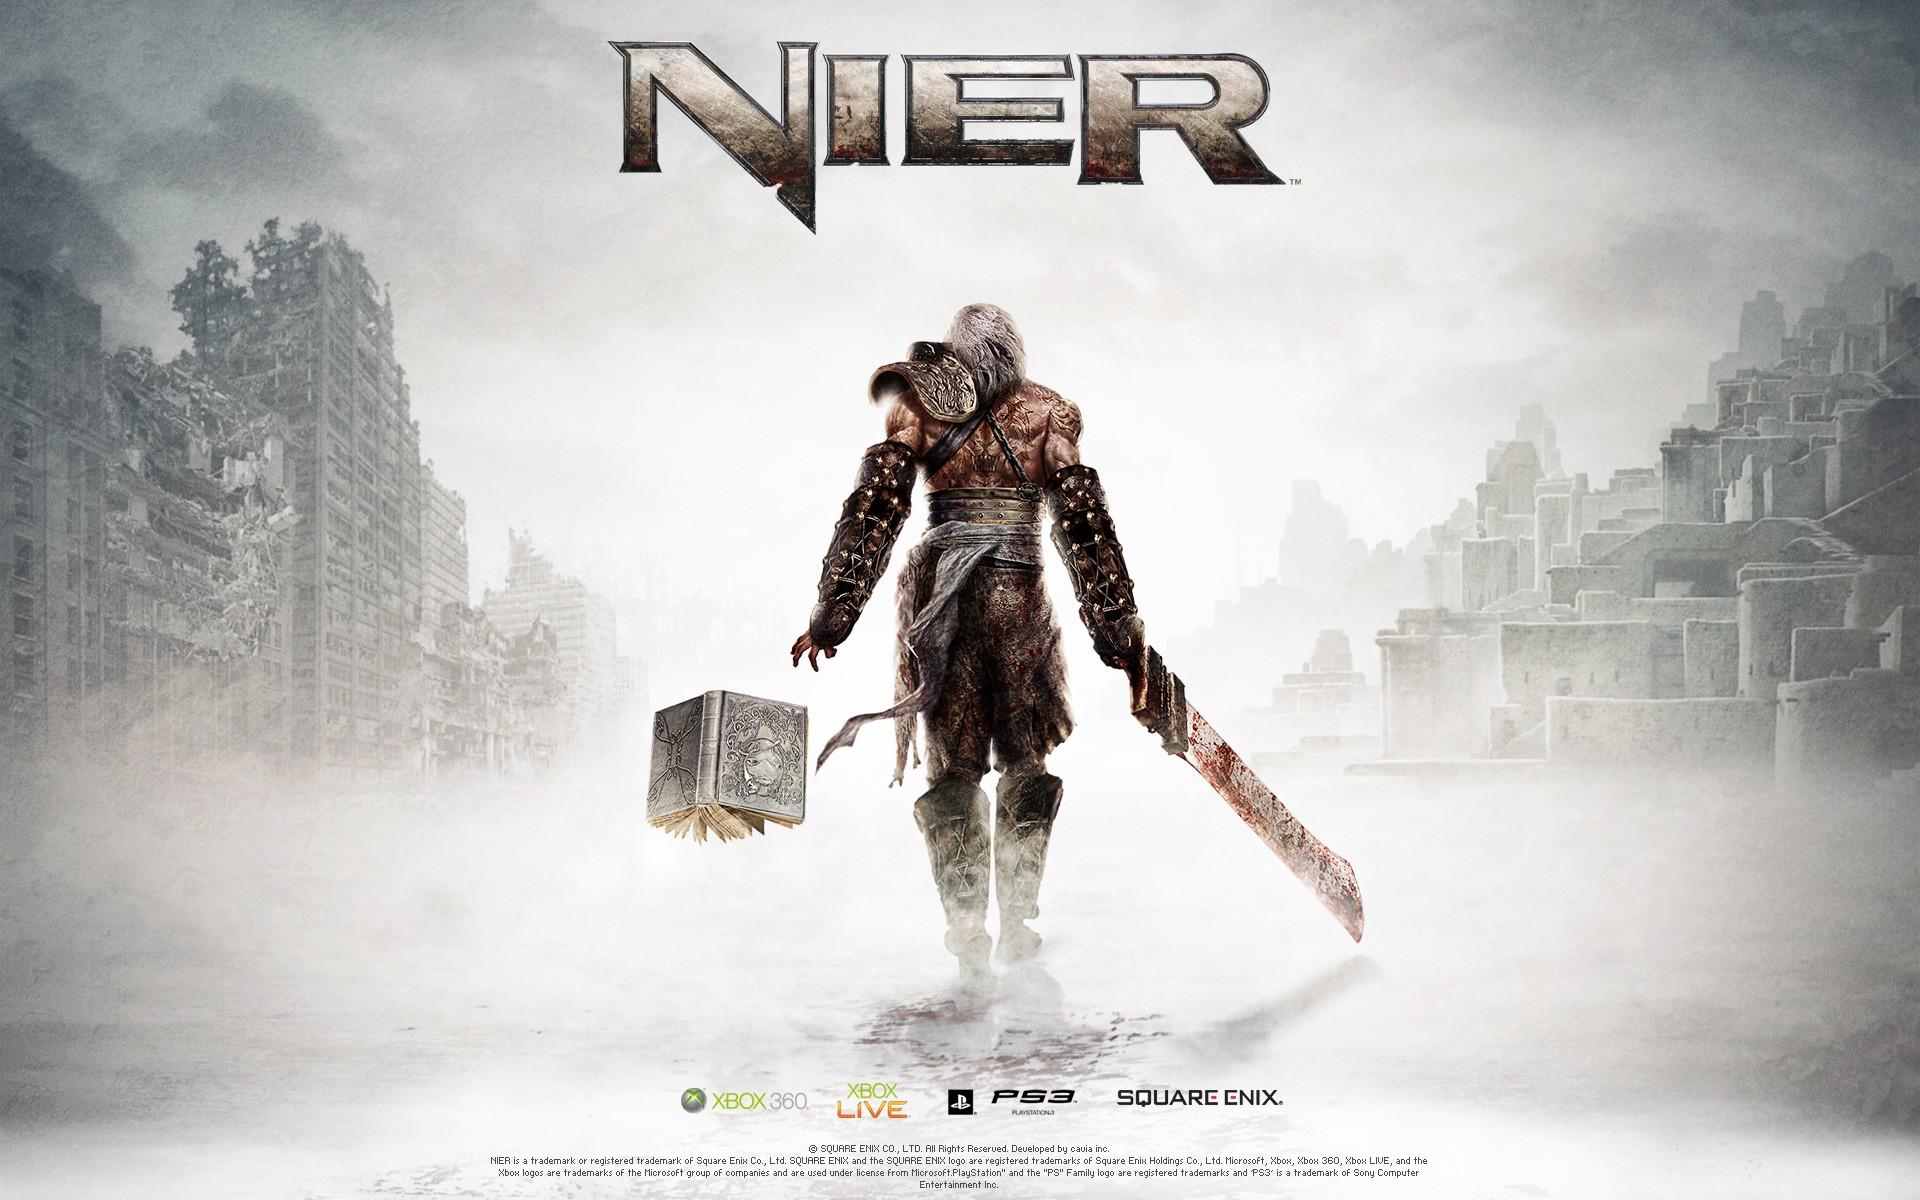 Nier (2010) Game Wallpapers  Hd Wallpapers  Id #8738